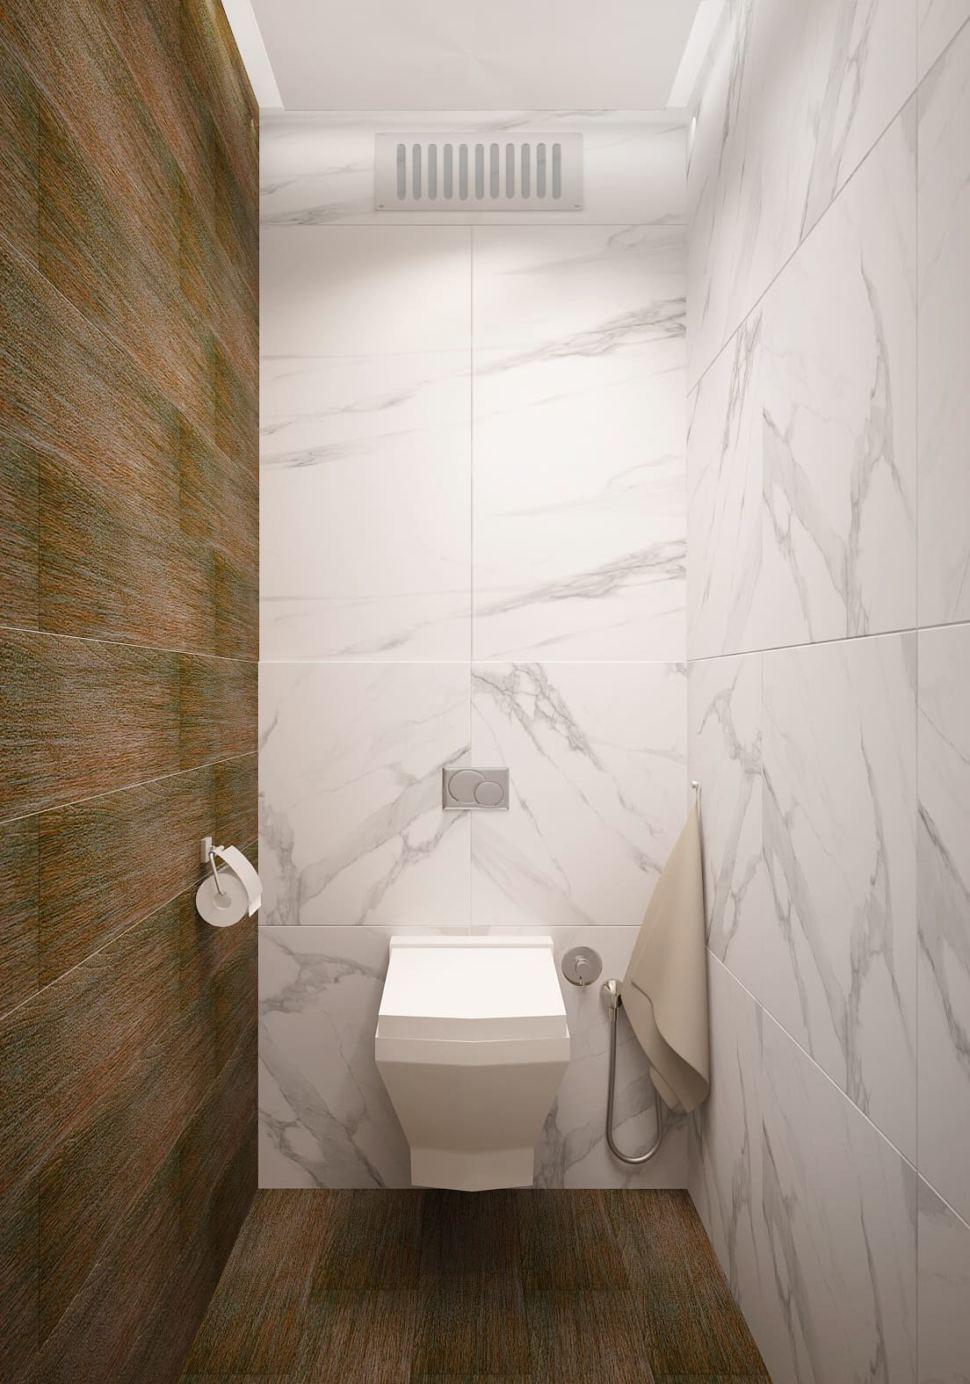 Визуализация санузла в белых тонах 2 кв.м, белая плитка под мрамор, унитаз, ламинат, светильники